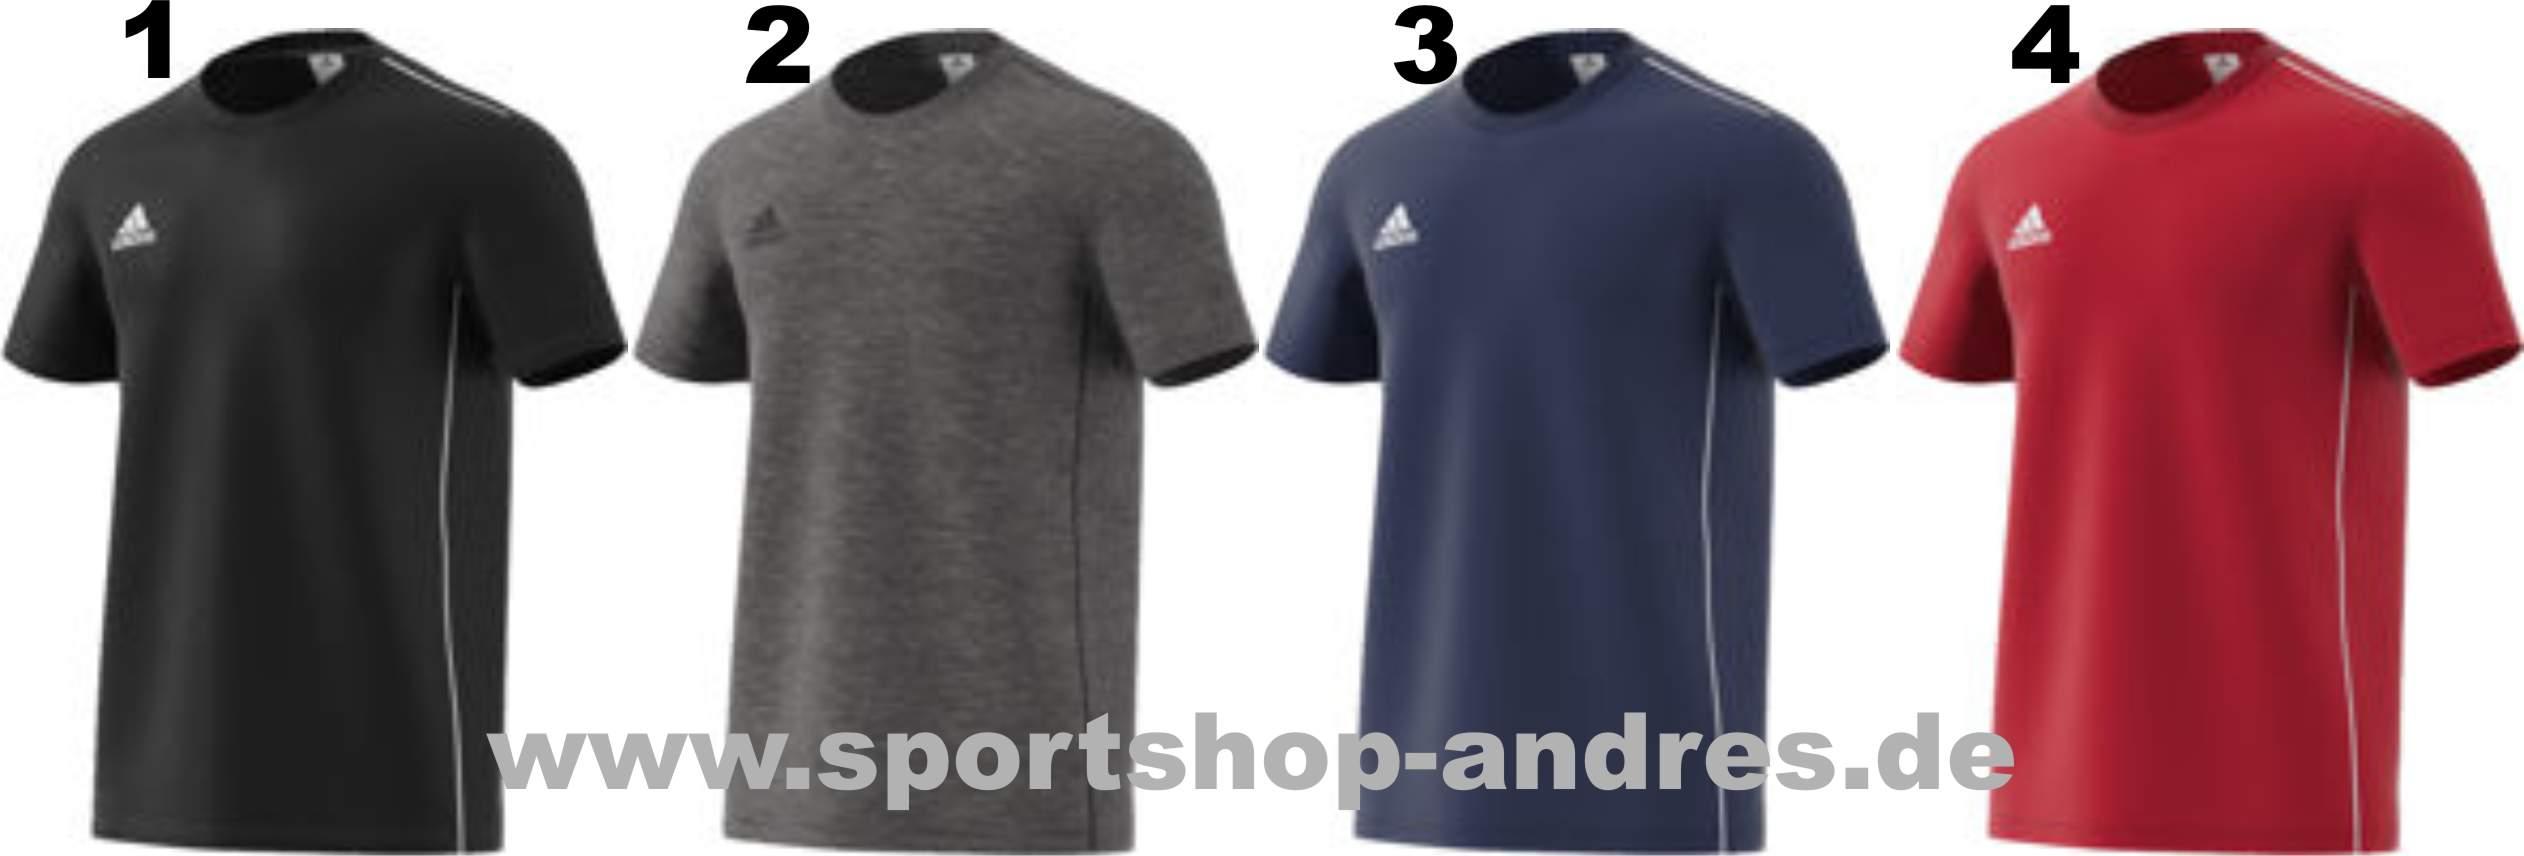 Sportshop Andres Adidas Core 18 Tee ab 11,97 Euro